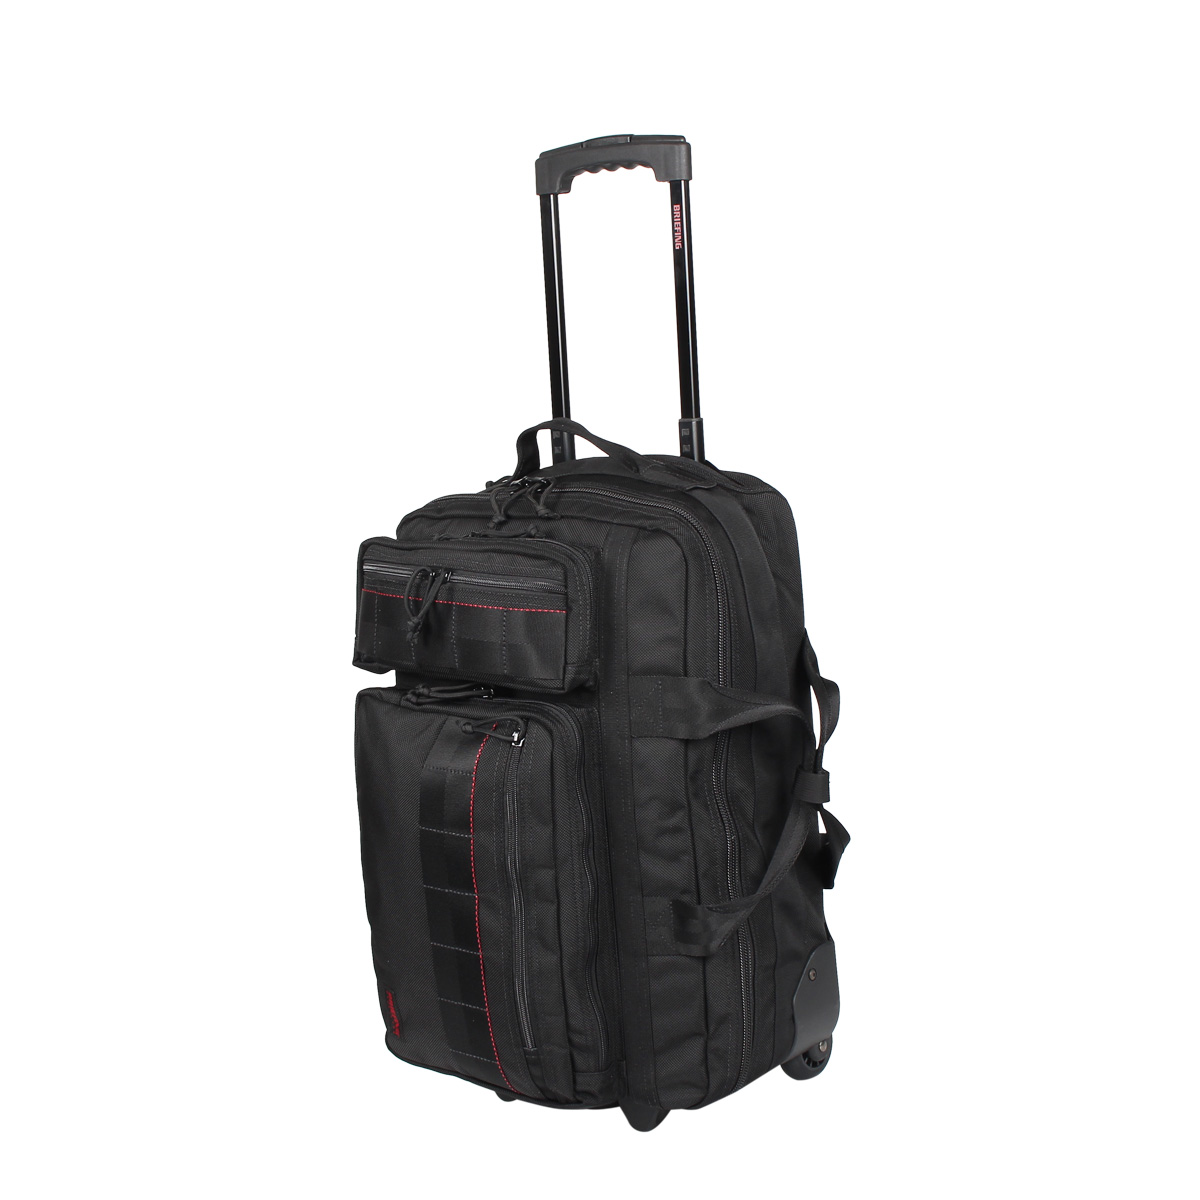 BRIEFING T-3 ブリーフィング バッグ スーツケース キャリーバッグ メンズ ブラック 黒 181501